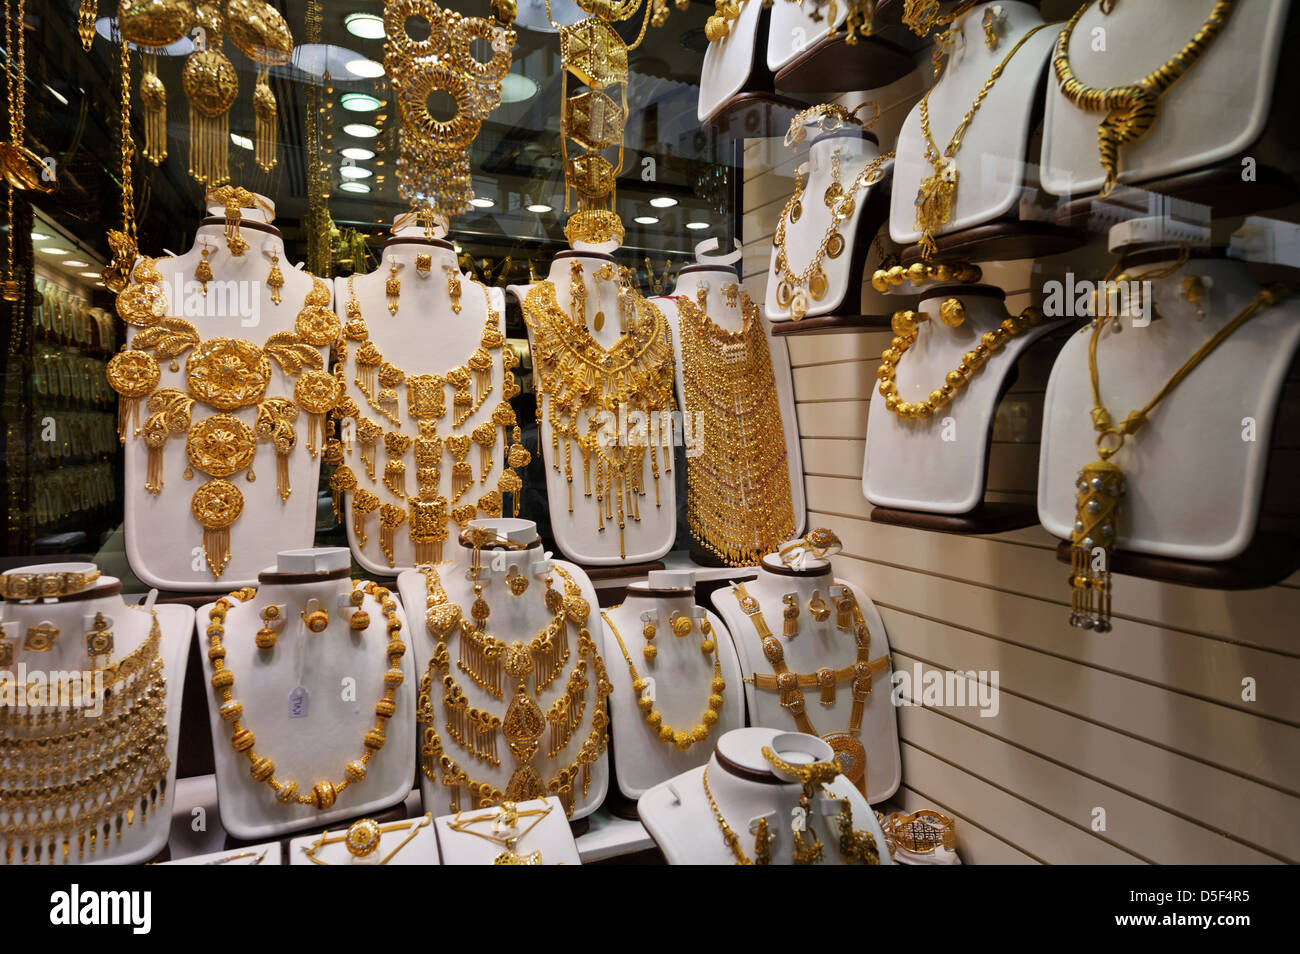 Where To Buy Cheap Wedding Rings In Dubai